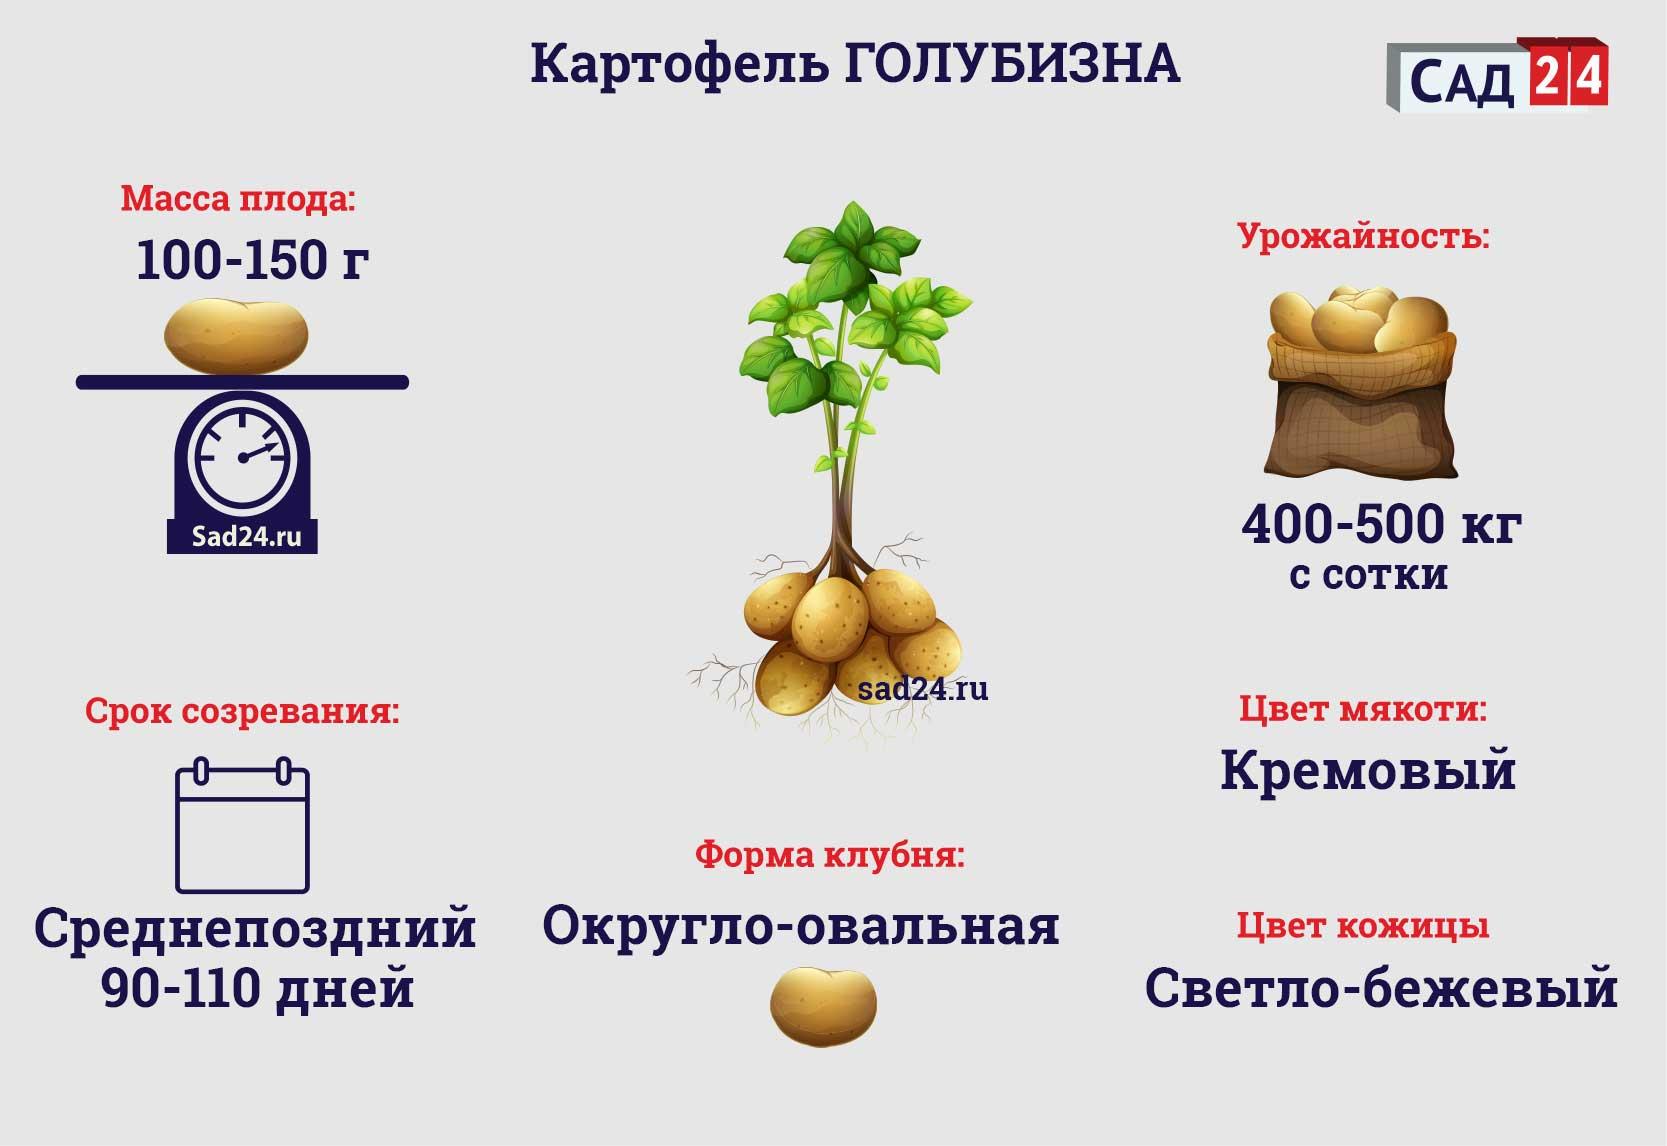 Голубизна - https://sad24.ru